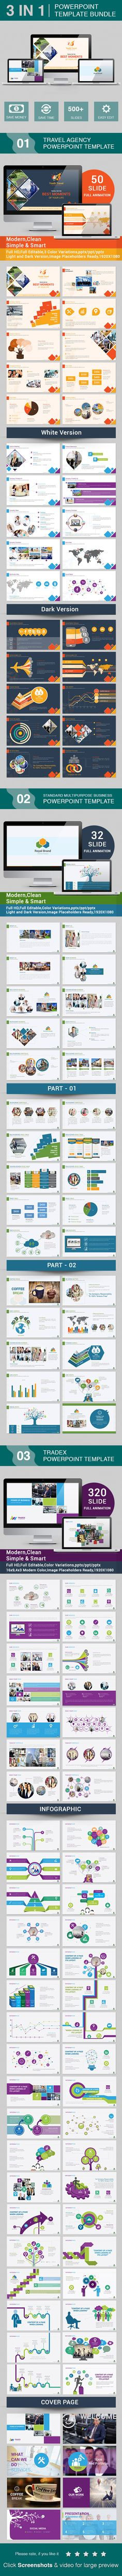 PowerPoint Bundle Template | Volume 1 - Business PowerPoint Templates